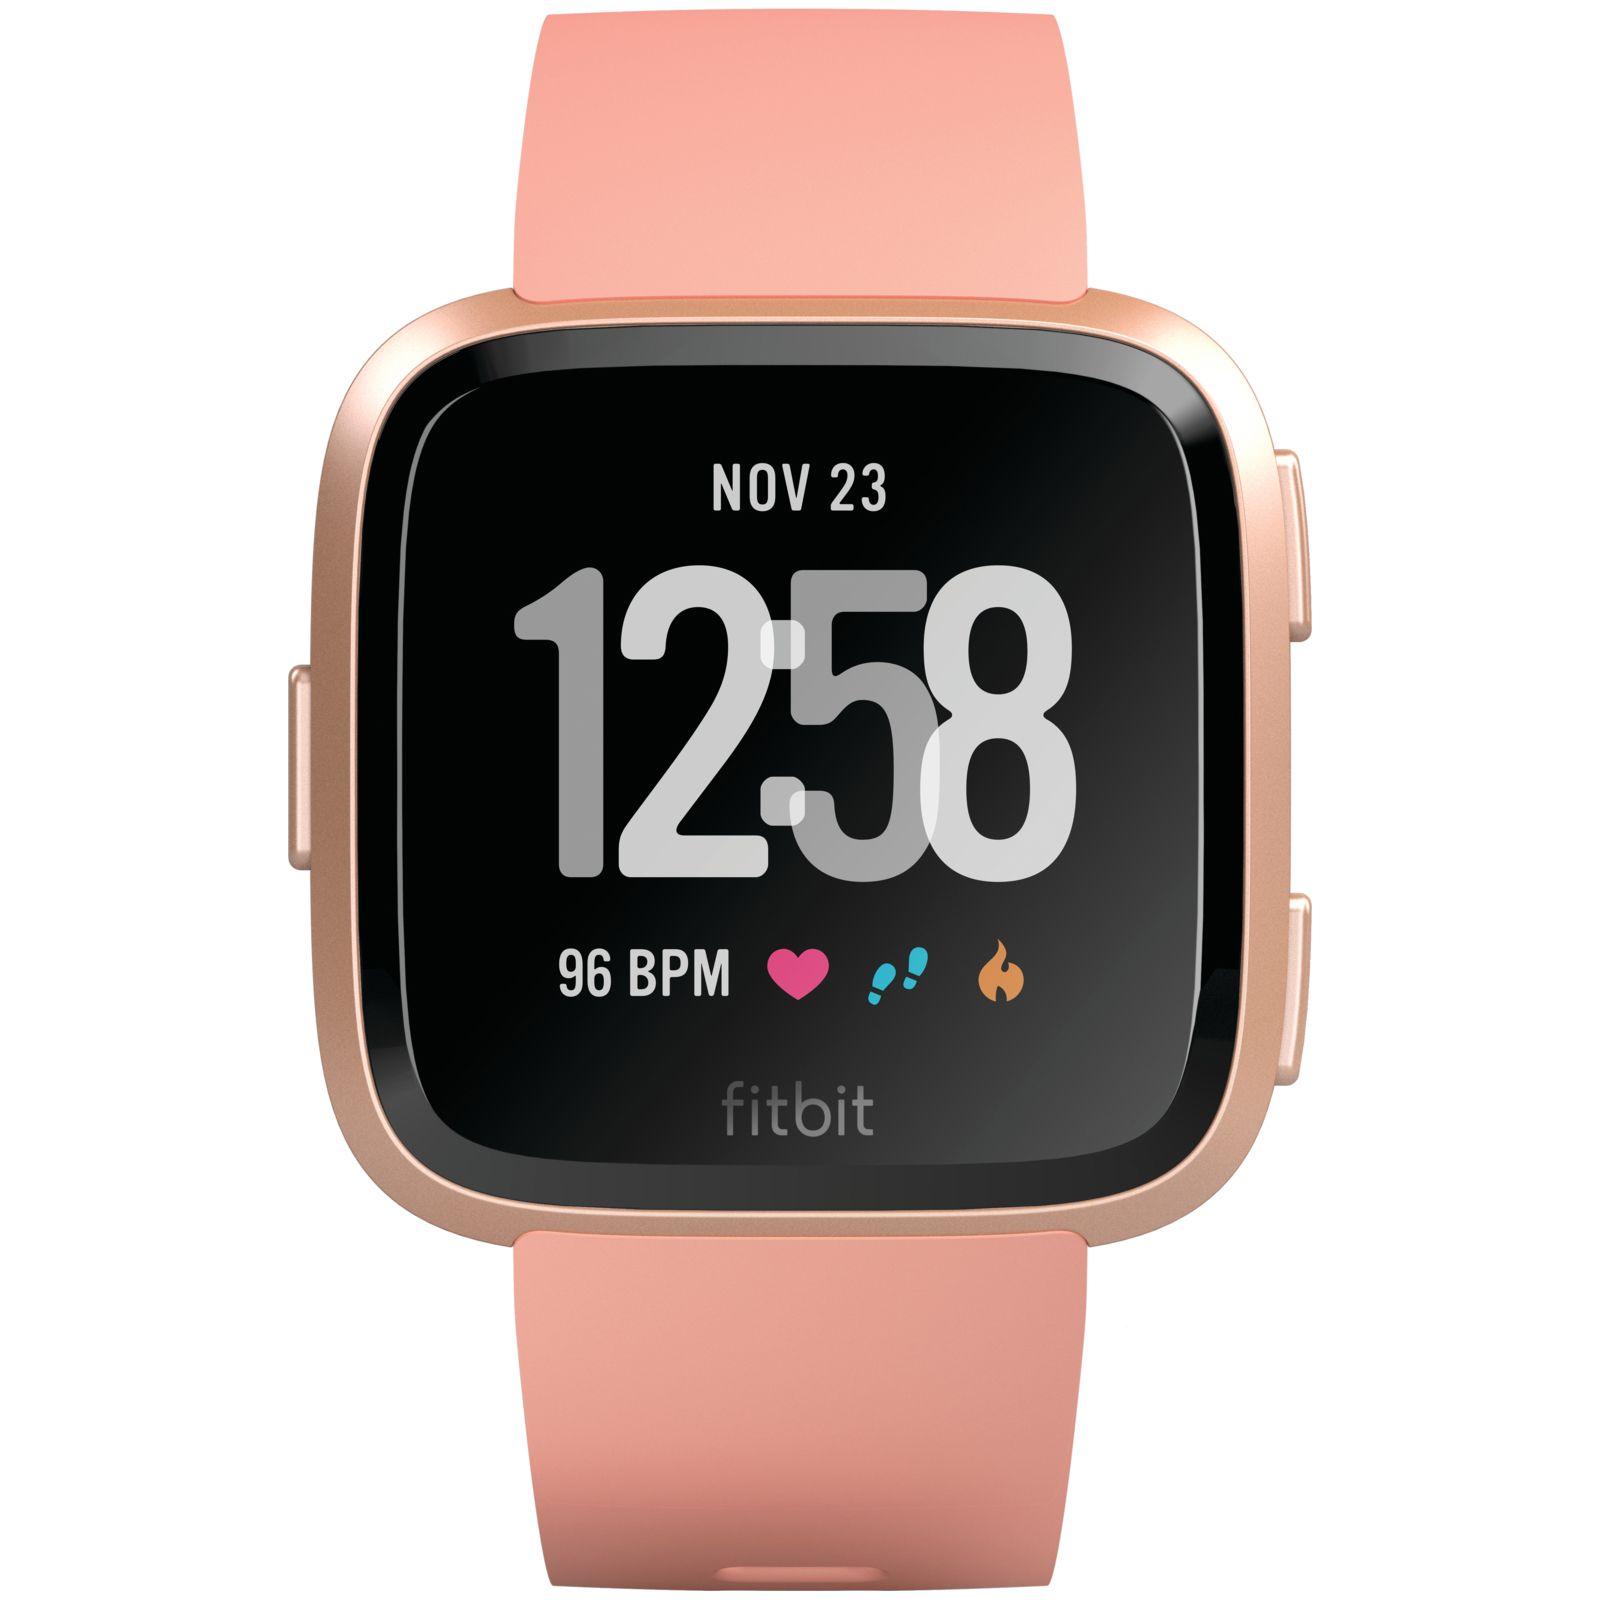 Smartwatch Fitbit Versa (NFC) - Peach / Rose Gold Aluminum